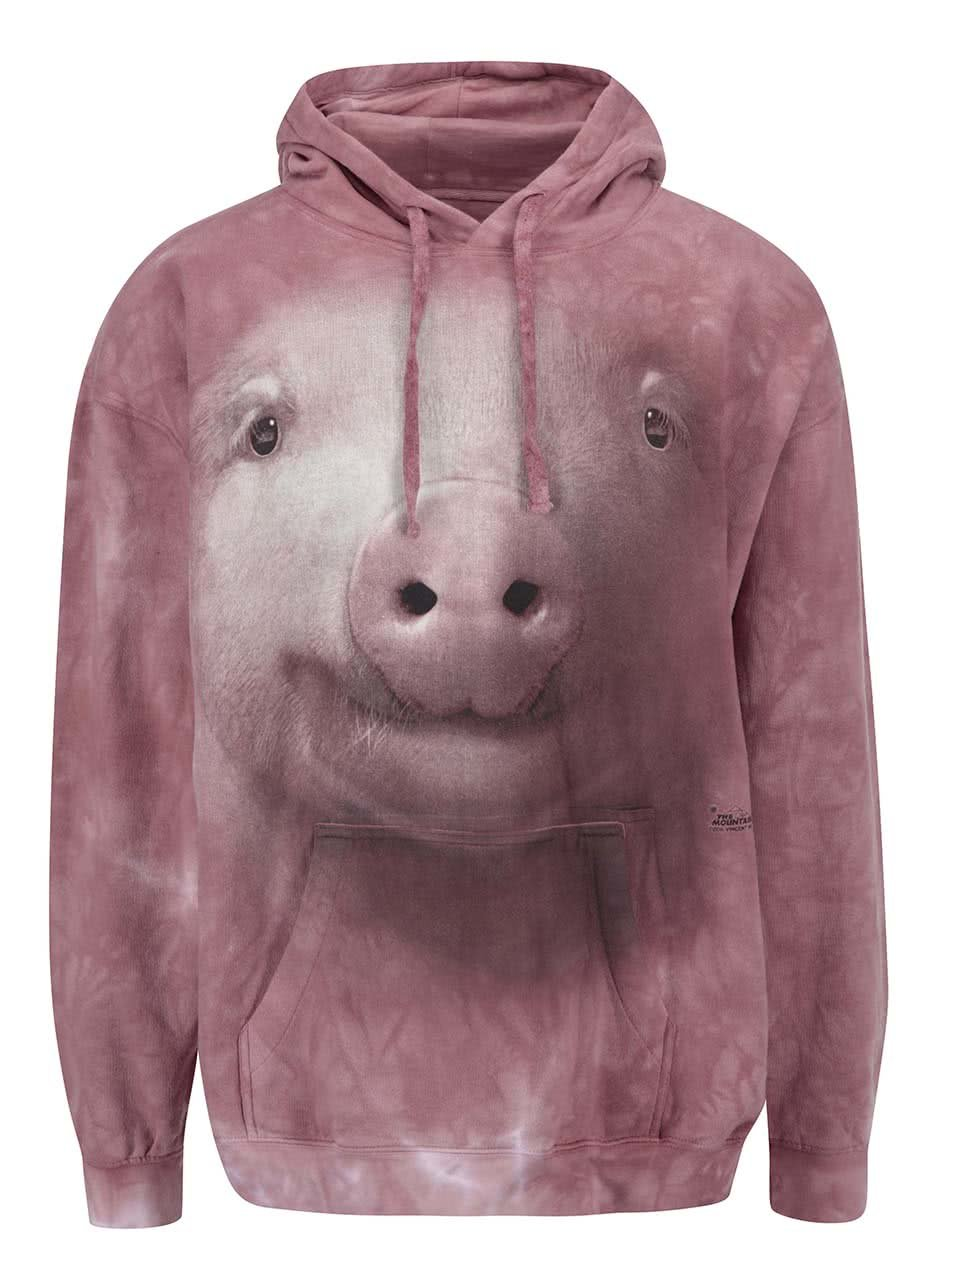 Unisex mikina The Mountain Pig